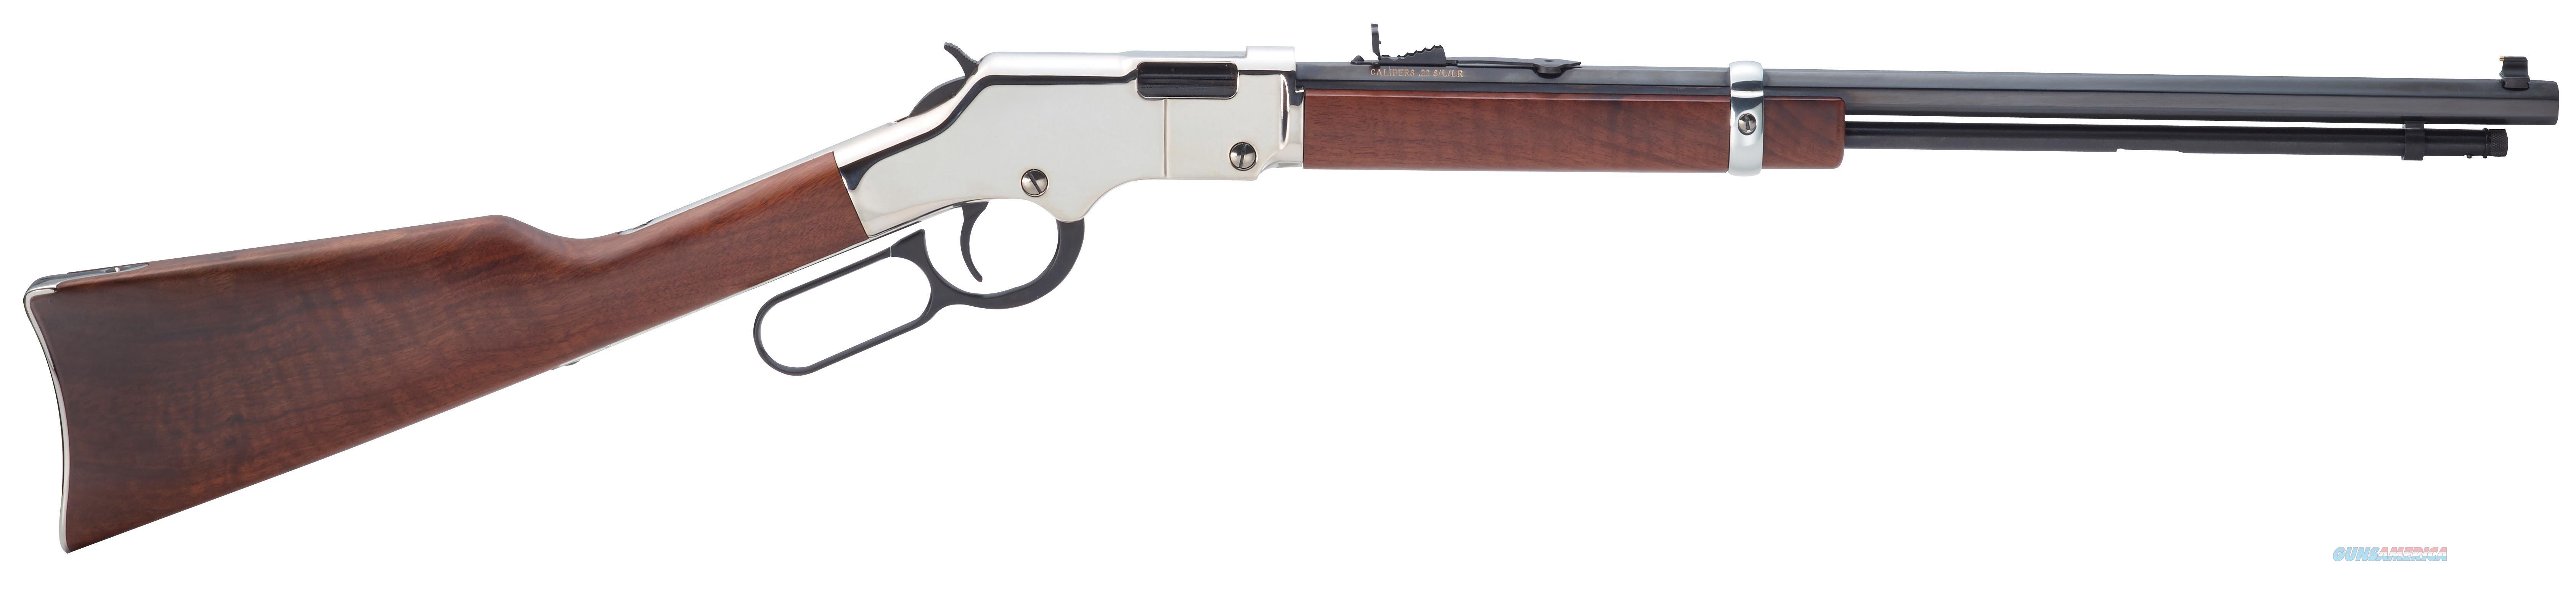 "Henry H004sm Silver Boy 22 Wmr Lever 22 Winchester Magnum Rimfire (Wmr) 20"" 12+1 American Walnut Stk Blued Barrel/Nickel Receiver H004SM  Guns > Rifles > H Misc Rifles"